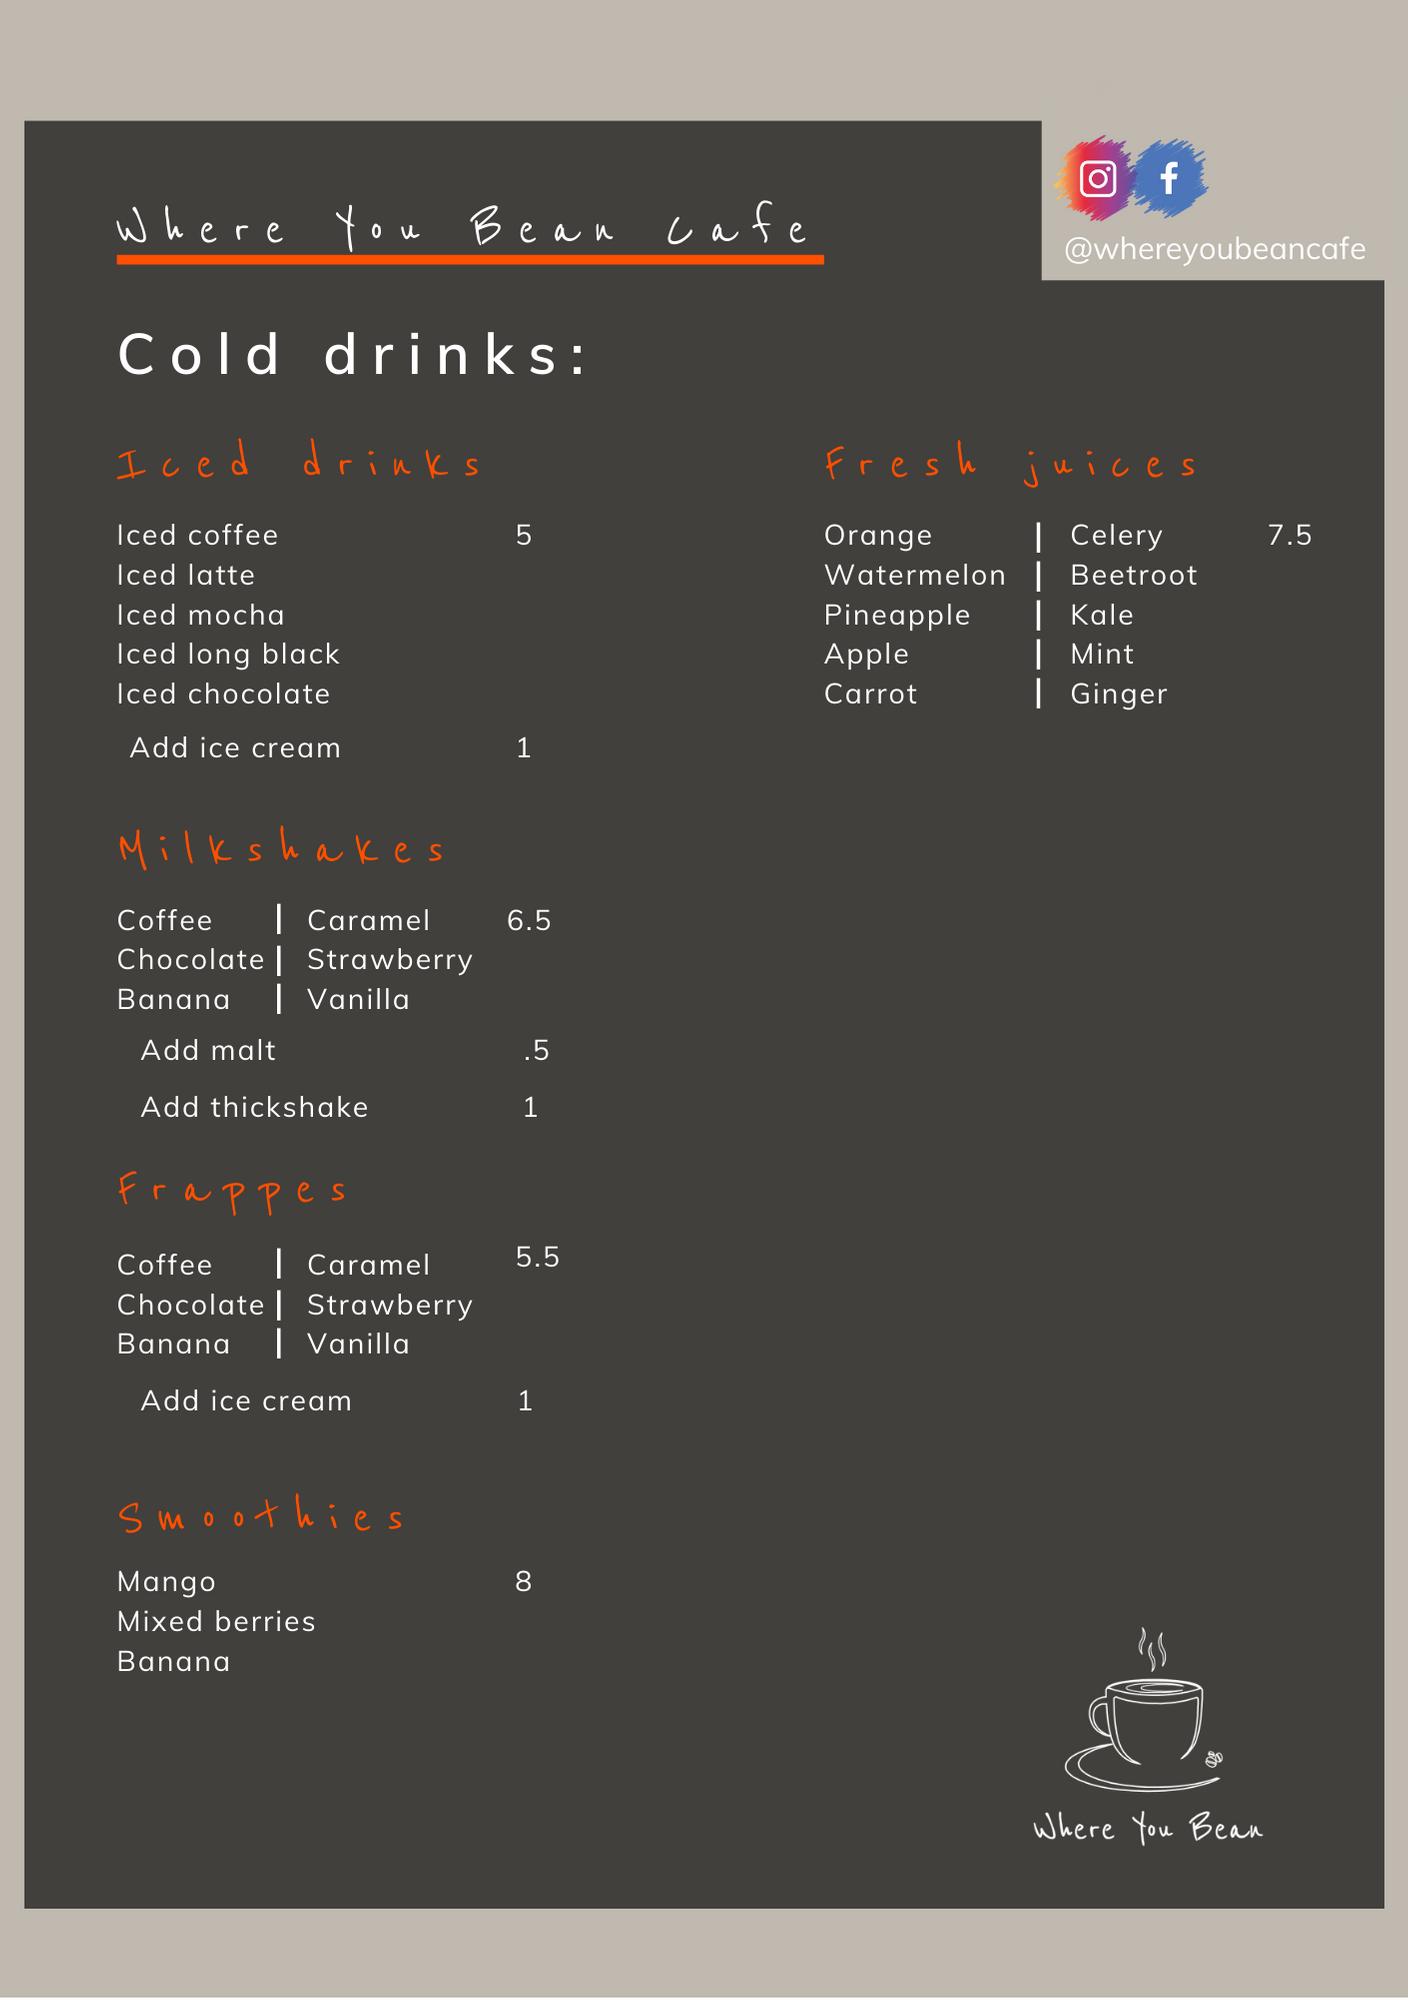 where-you-bean-cafe-drinks-menu